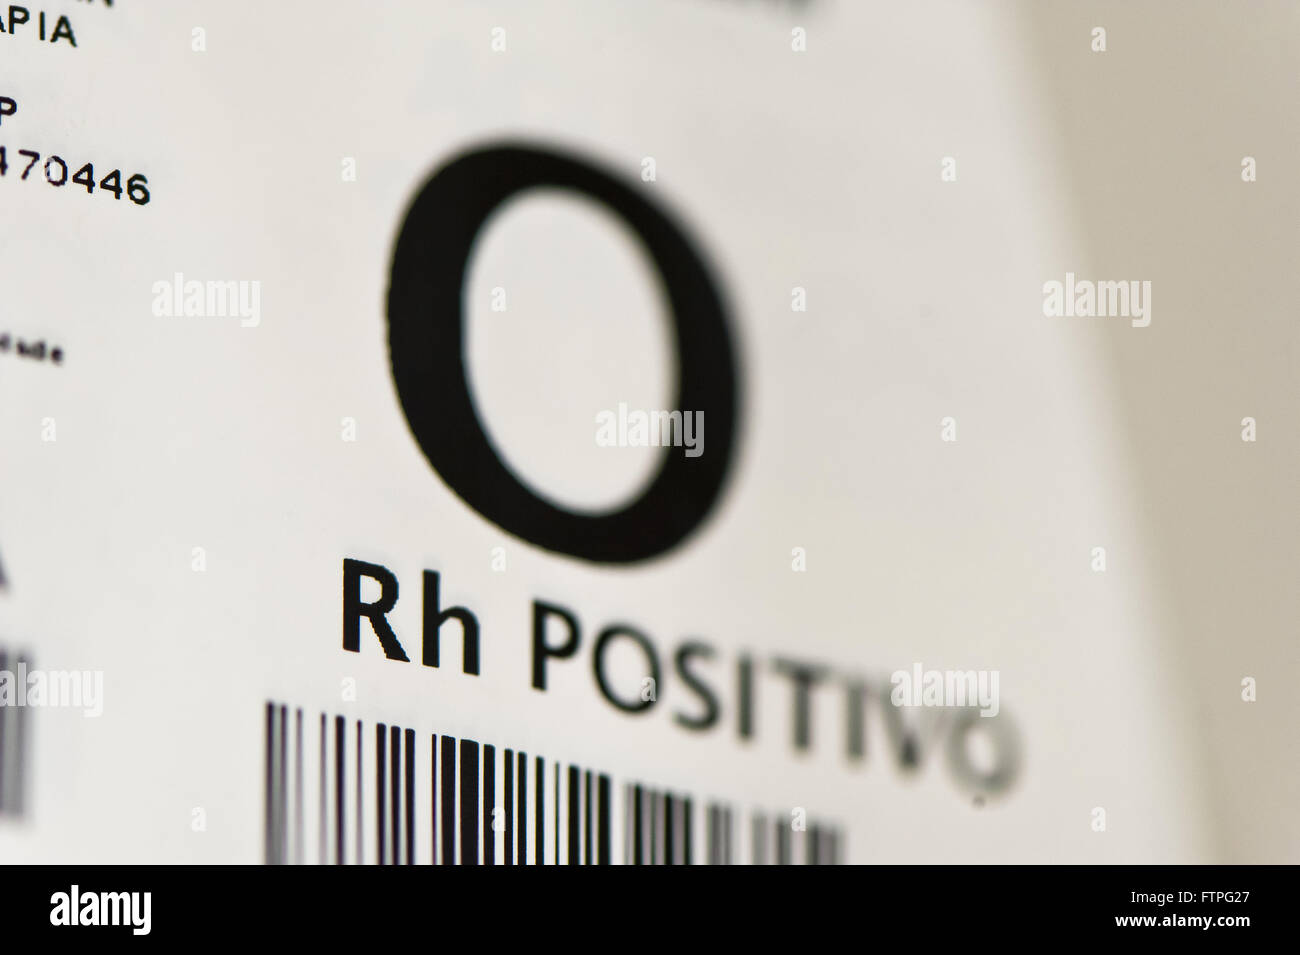 Barcode blood bag - Stock Image